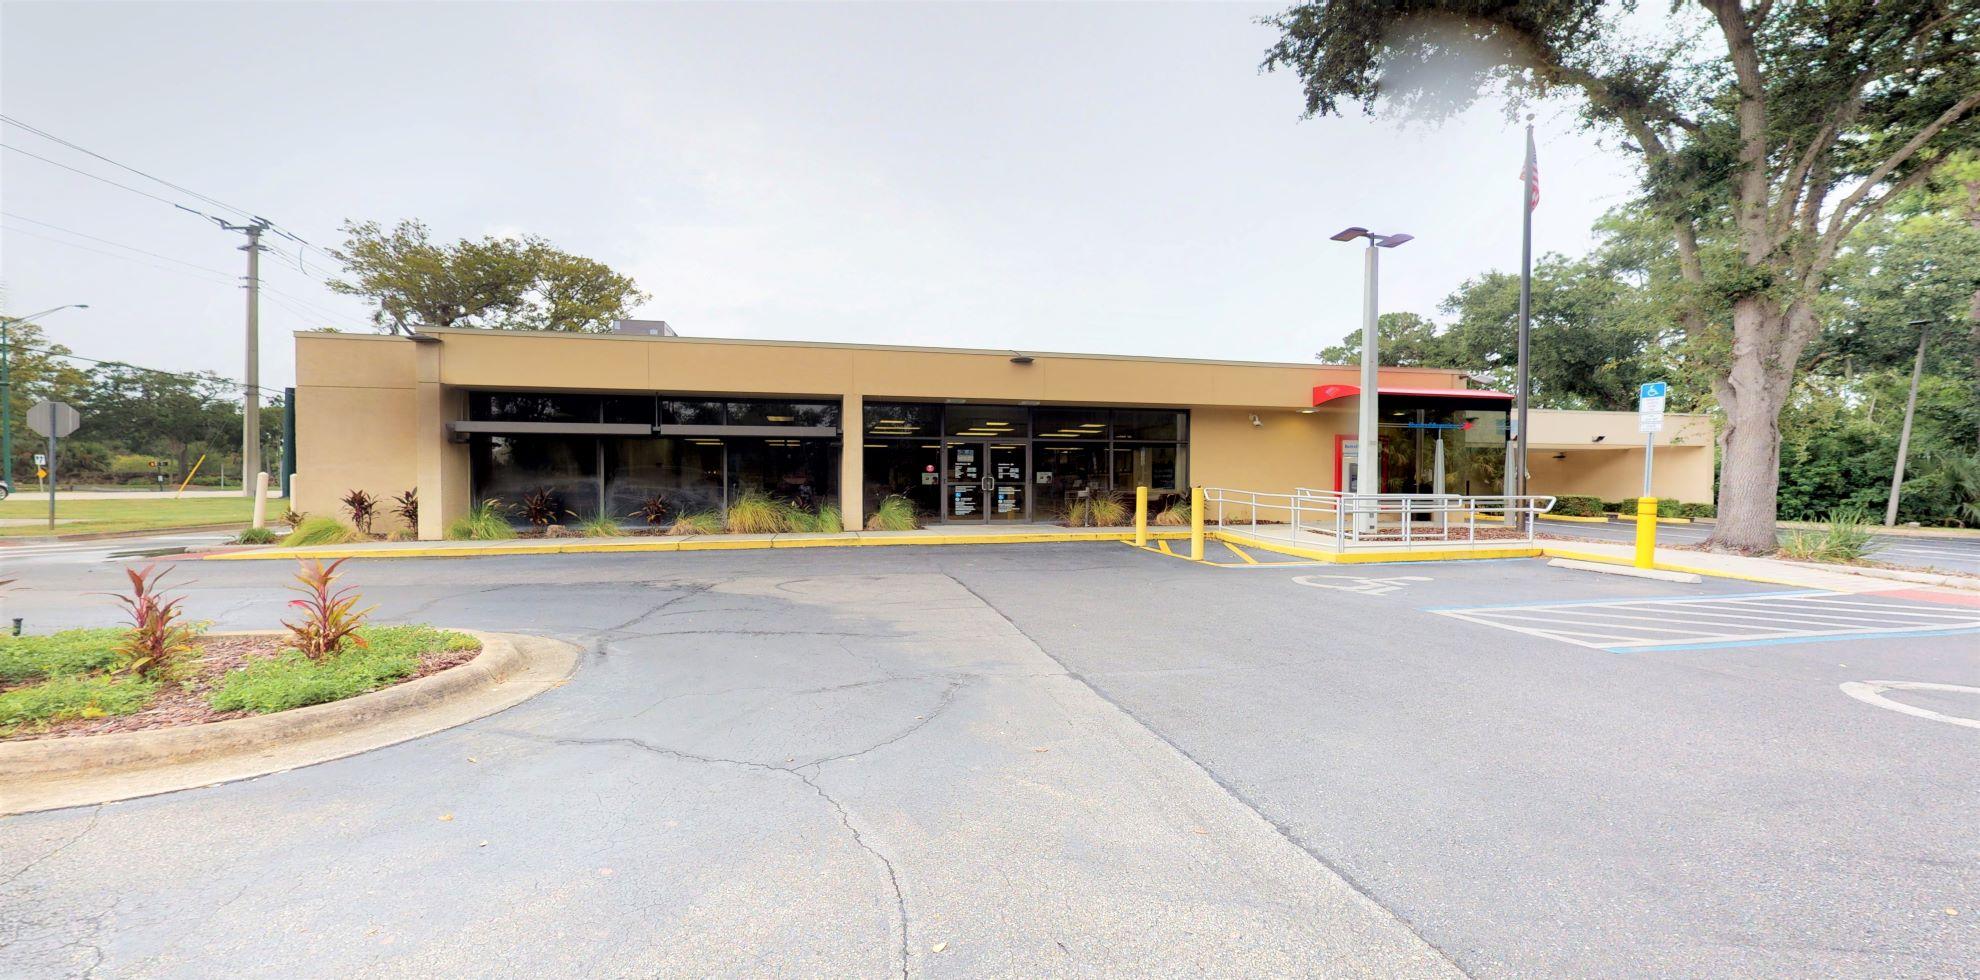 Bank of America financial center with walk-up ATM   299 N Nova Rd, Ormond Beach, FL 32174